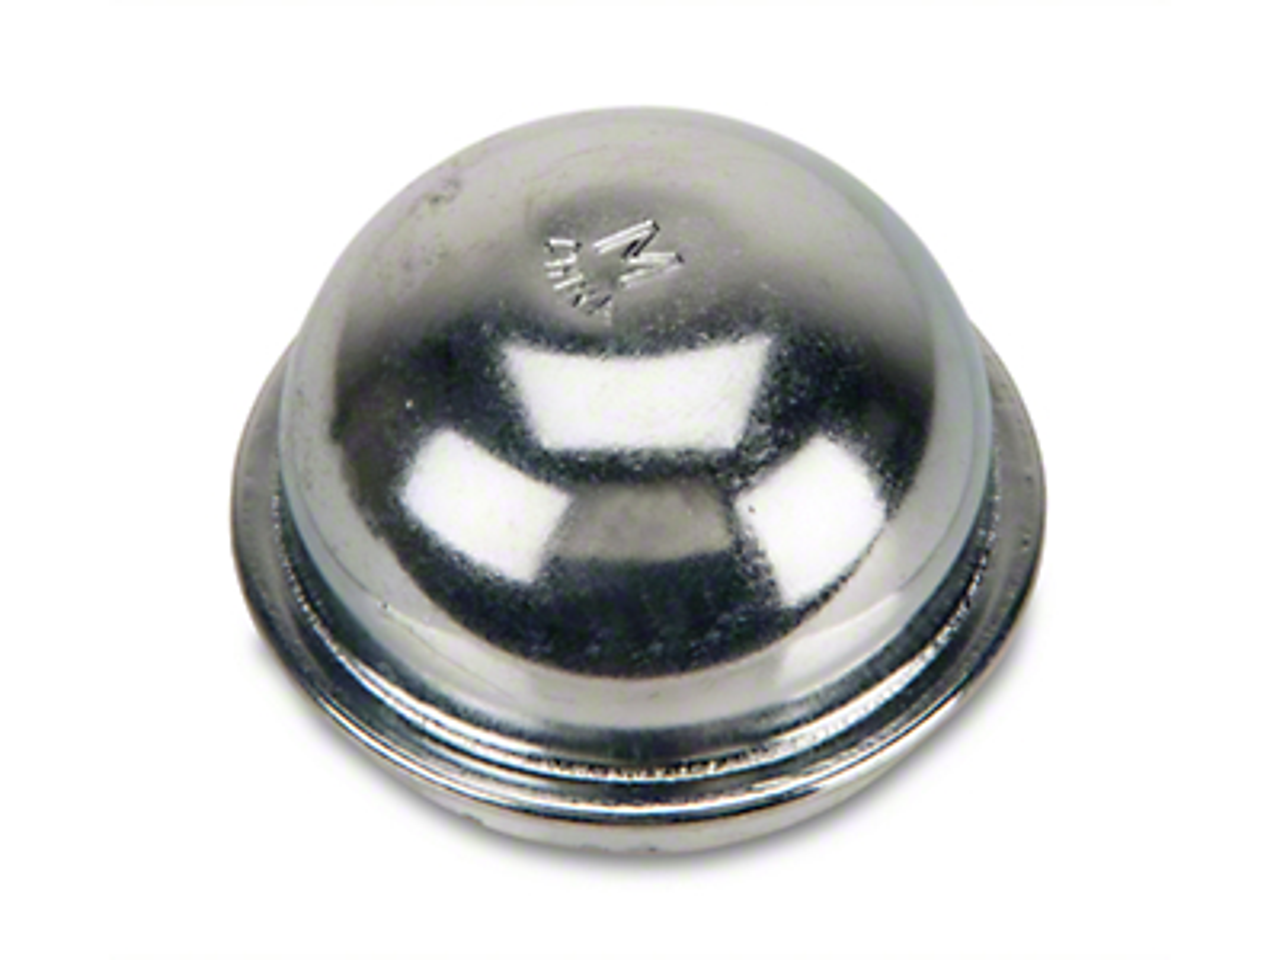 OPR Wheel Bearing Dust Cap - 5 Pack (79-93 All)